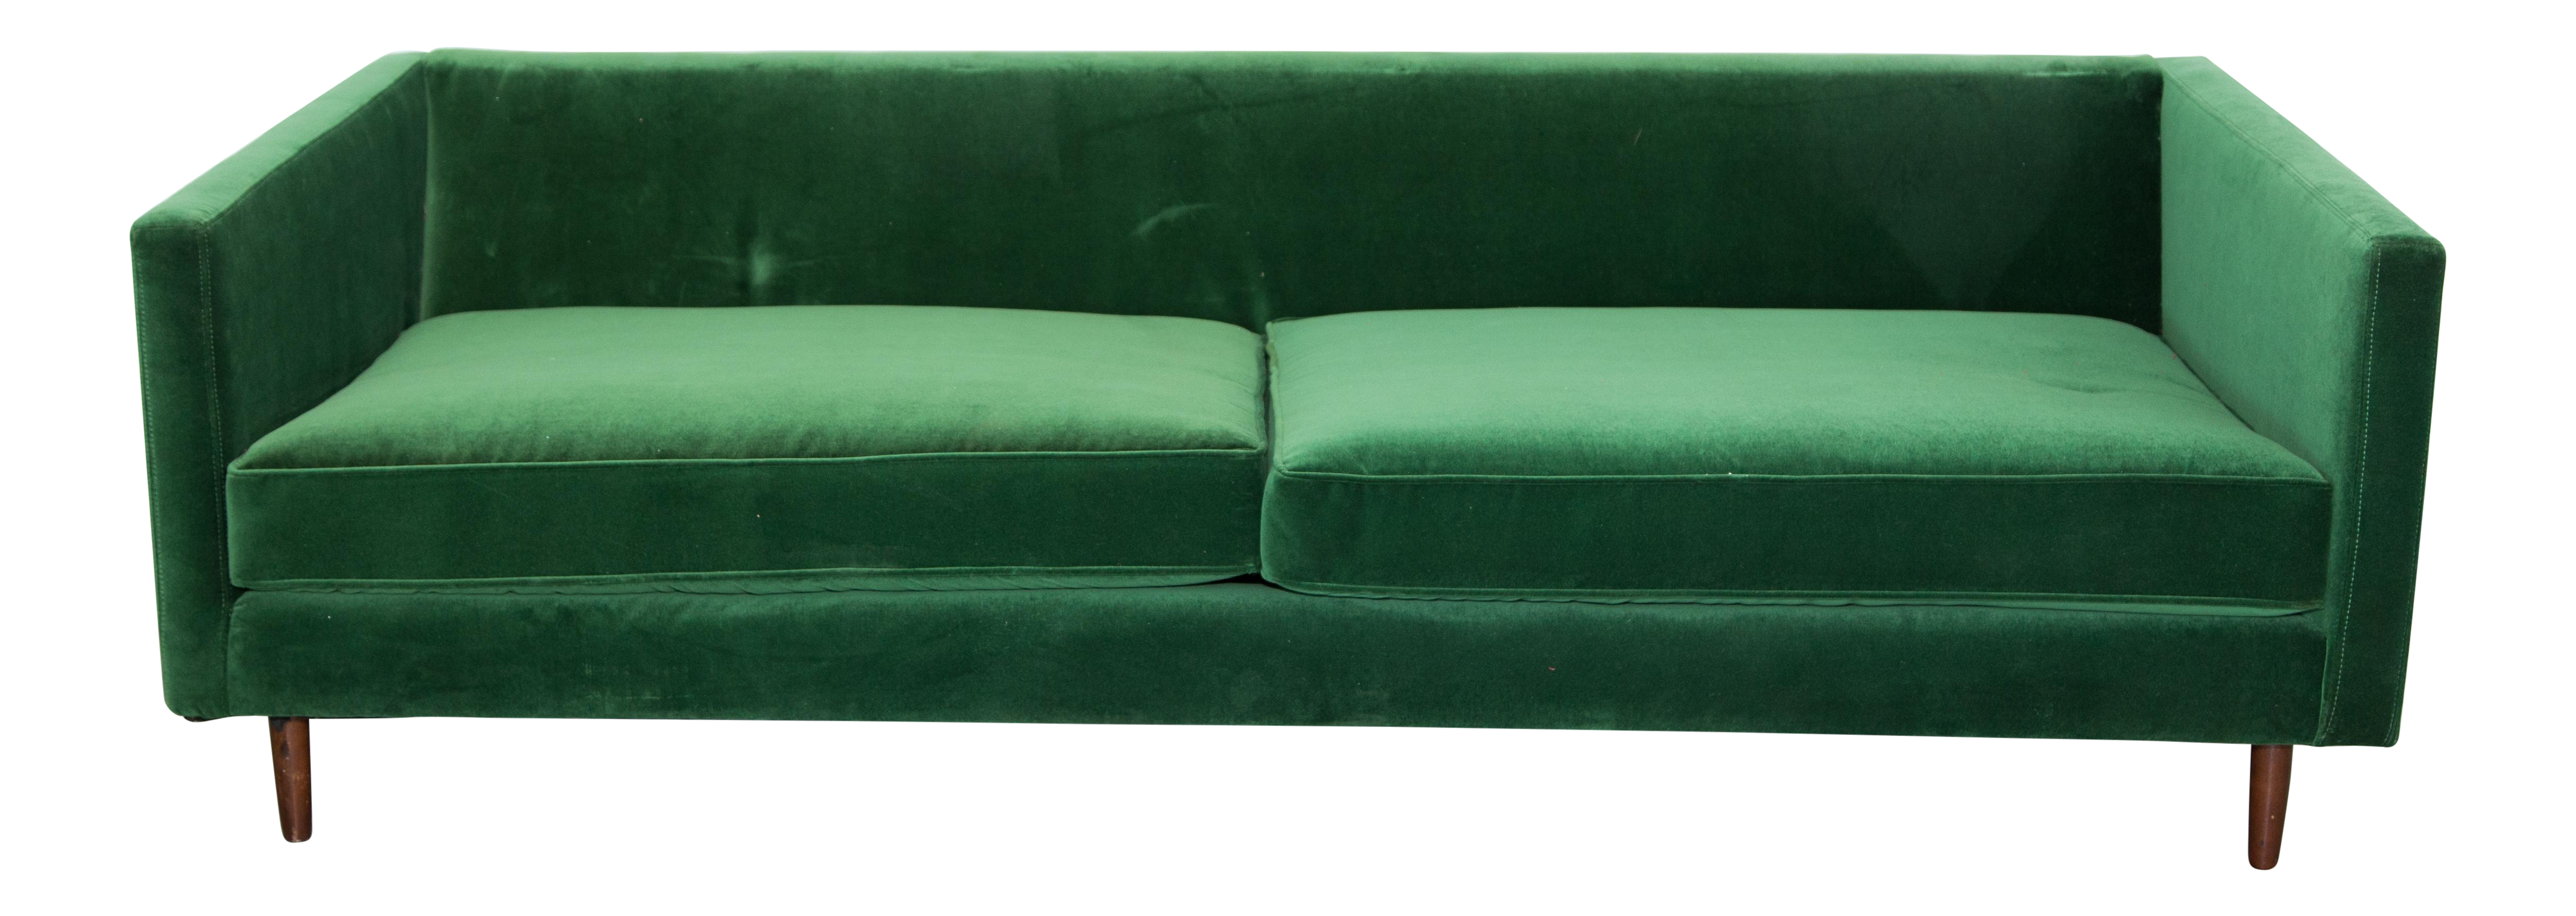 Mid Century Emerald Green Velvet Sofa